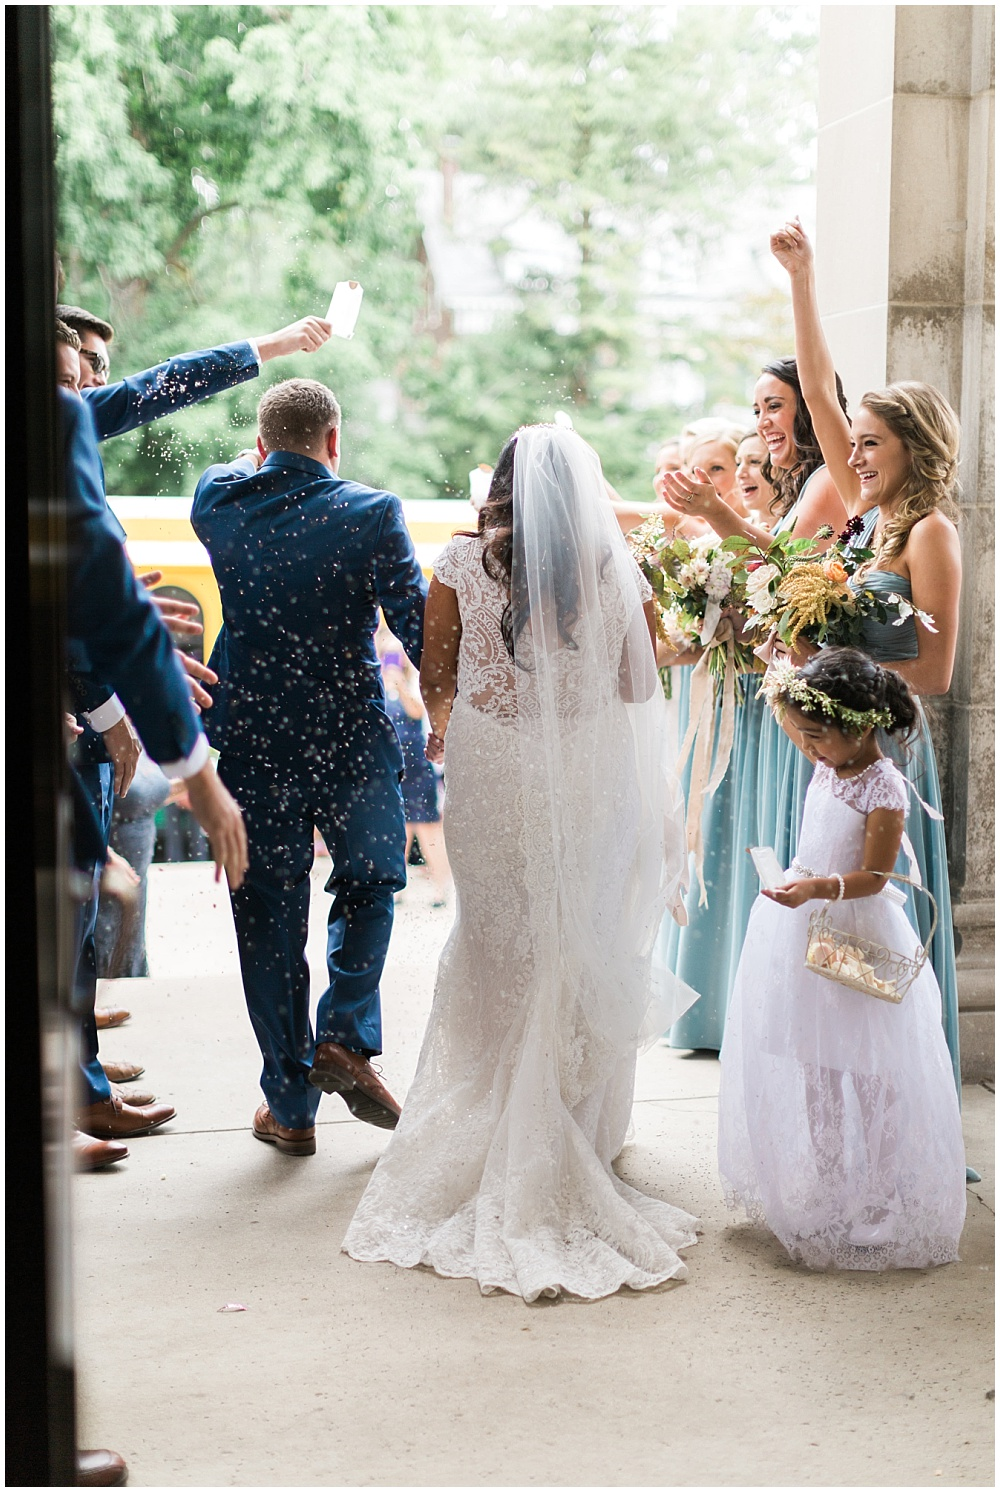 7 Waysto Make Your Wedding Interactive | interactive wedding; wedding ideas; church exit; confetti toss; wedding exit; formal exit; birdseed toss; lavender toss